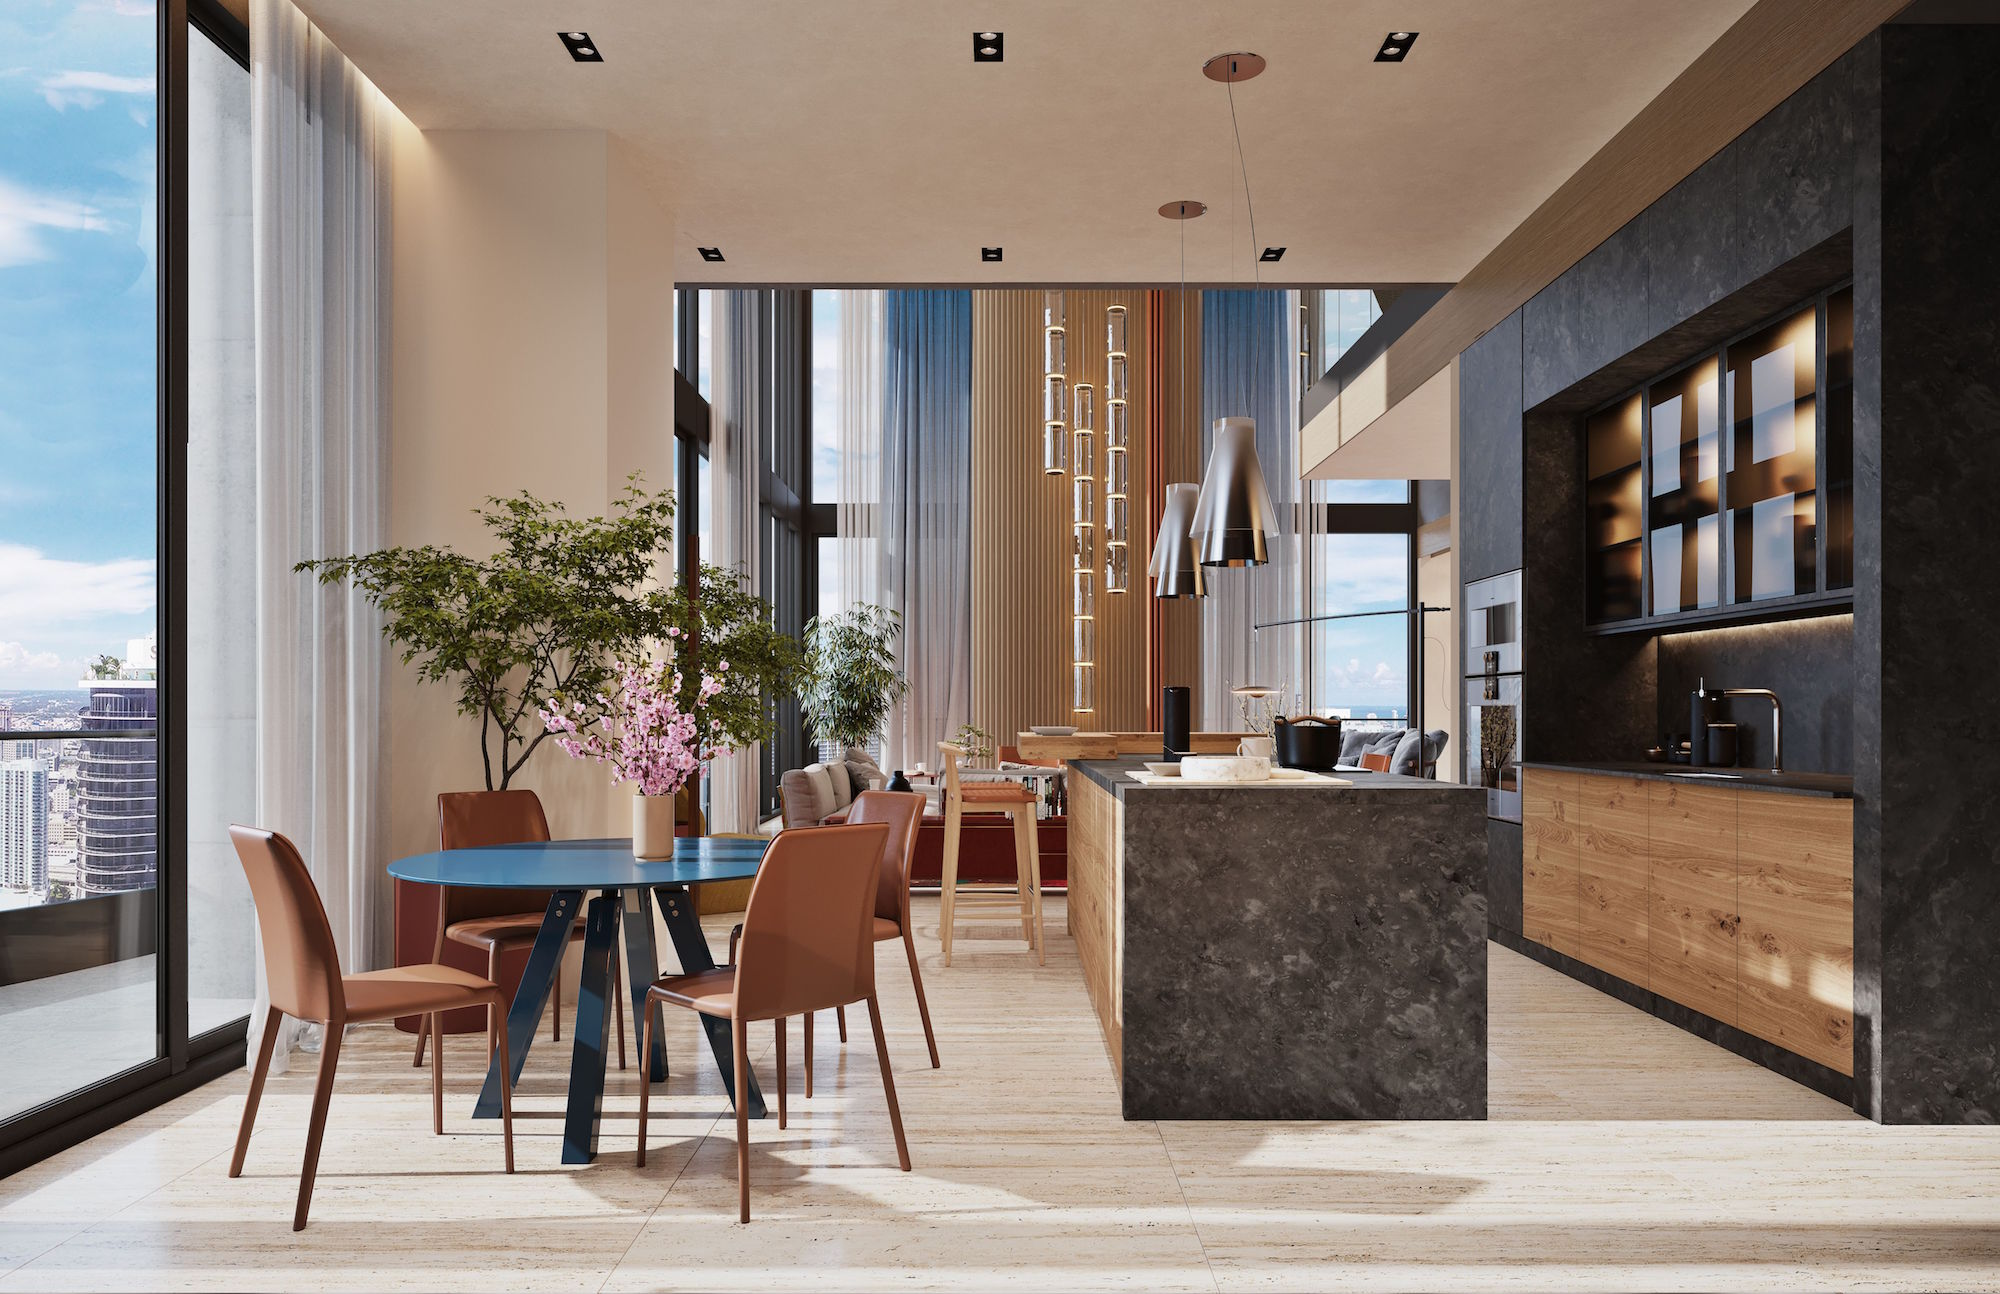 Brickell Flatiron - oct 2020 2